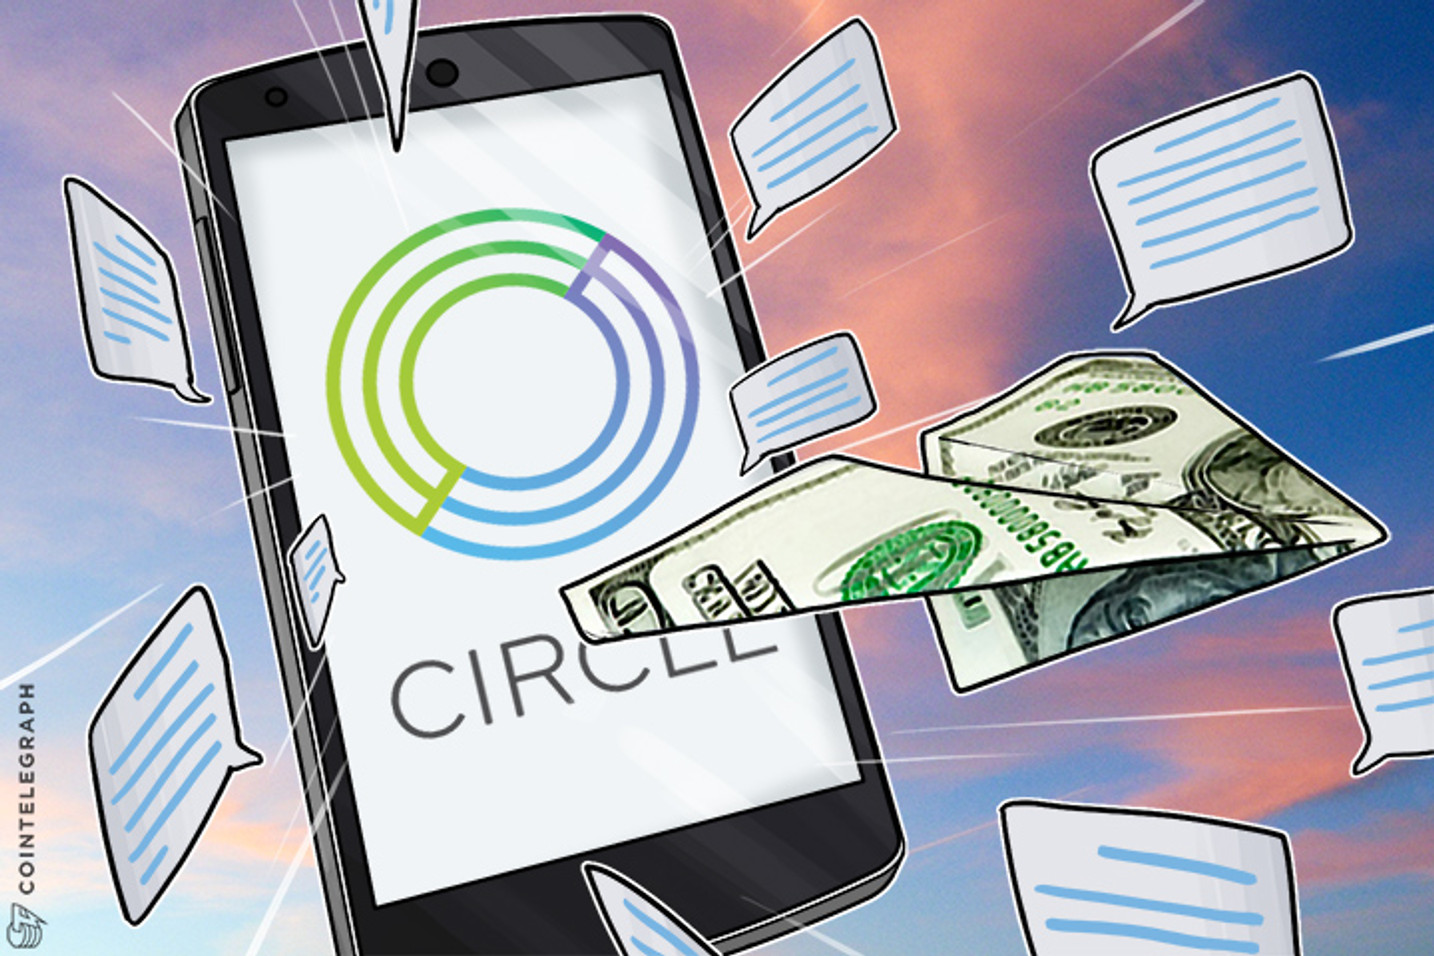 Circle Terminates Bitcoin Trading, Focuses on Next Generation Platform